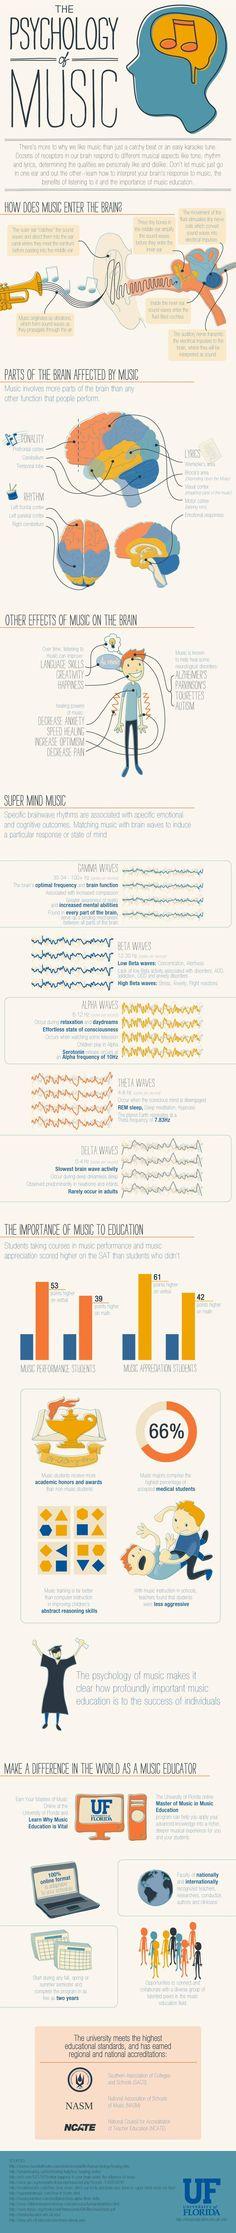 The Psychology of Music #Infographics — Shutterbug Seshat